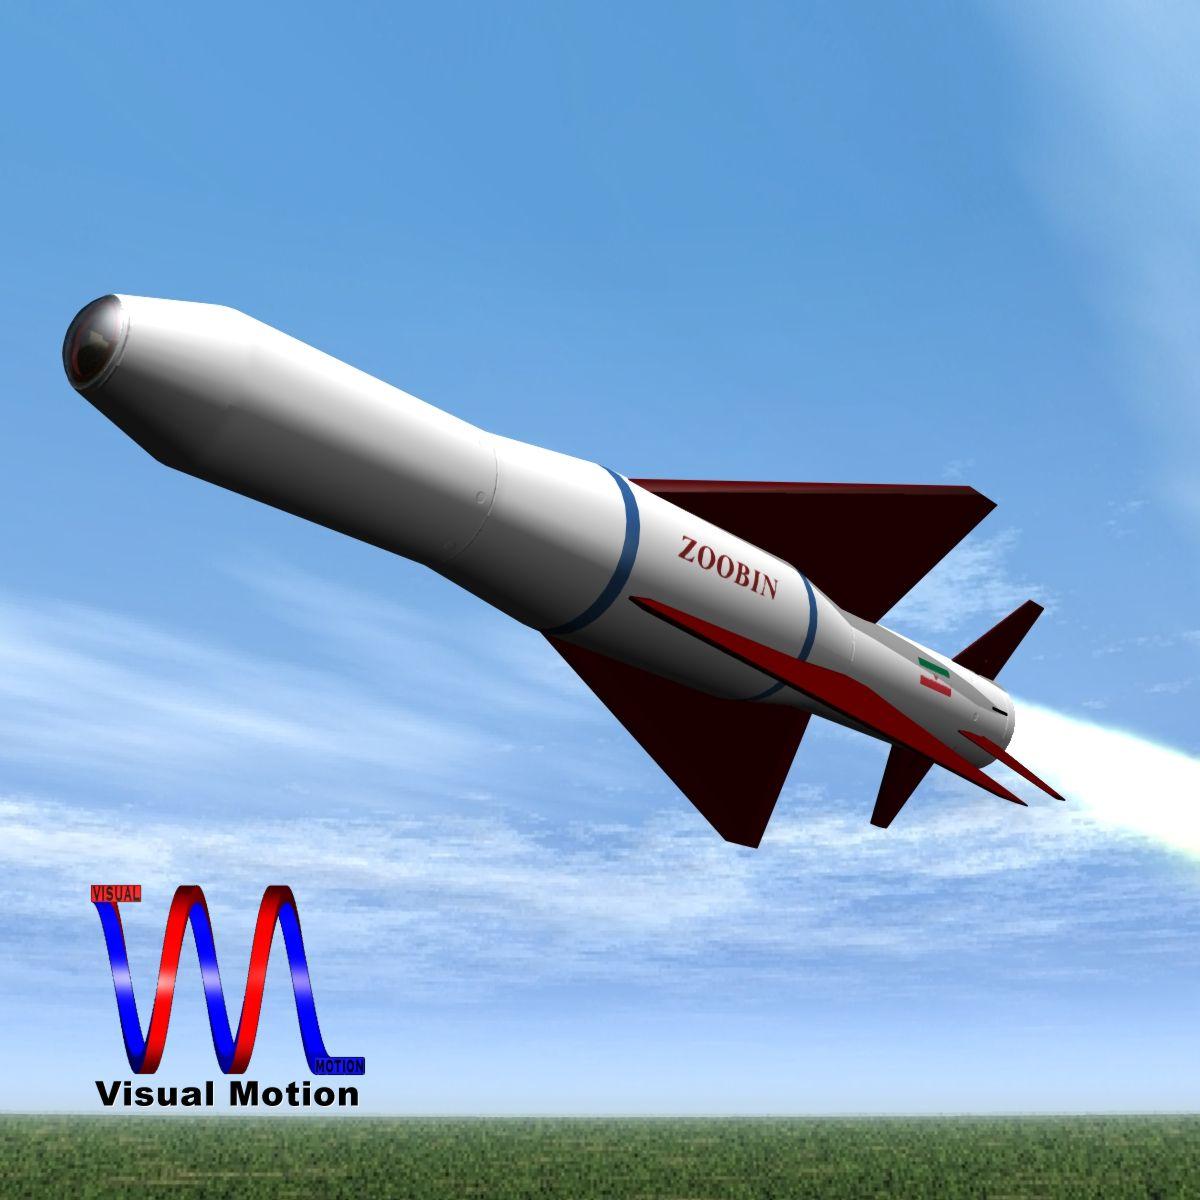 iranian agm-379 zoobin asm missile 3d model 3ds dxf fbx blend cob dae x obj 150577